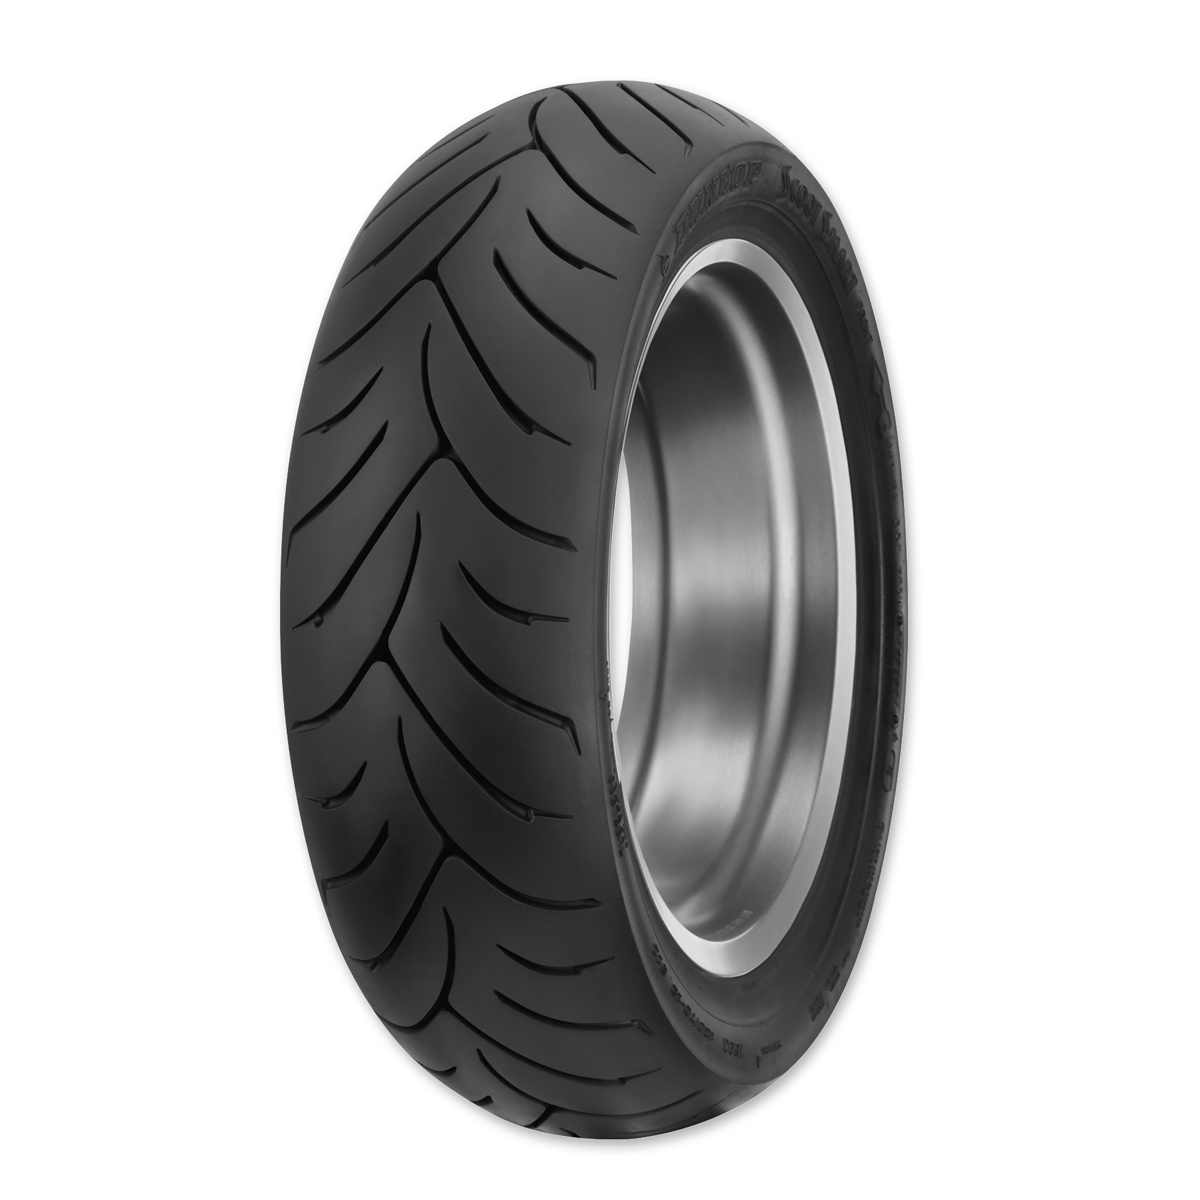 Dunlop Scootsmart  120/70-12  Front Tire